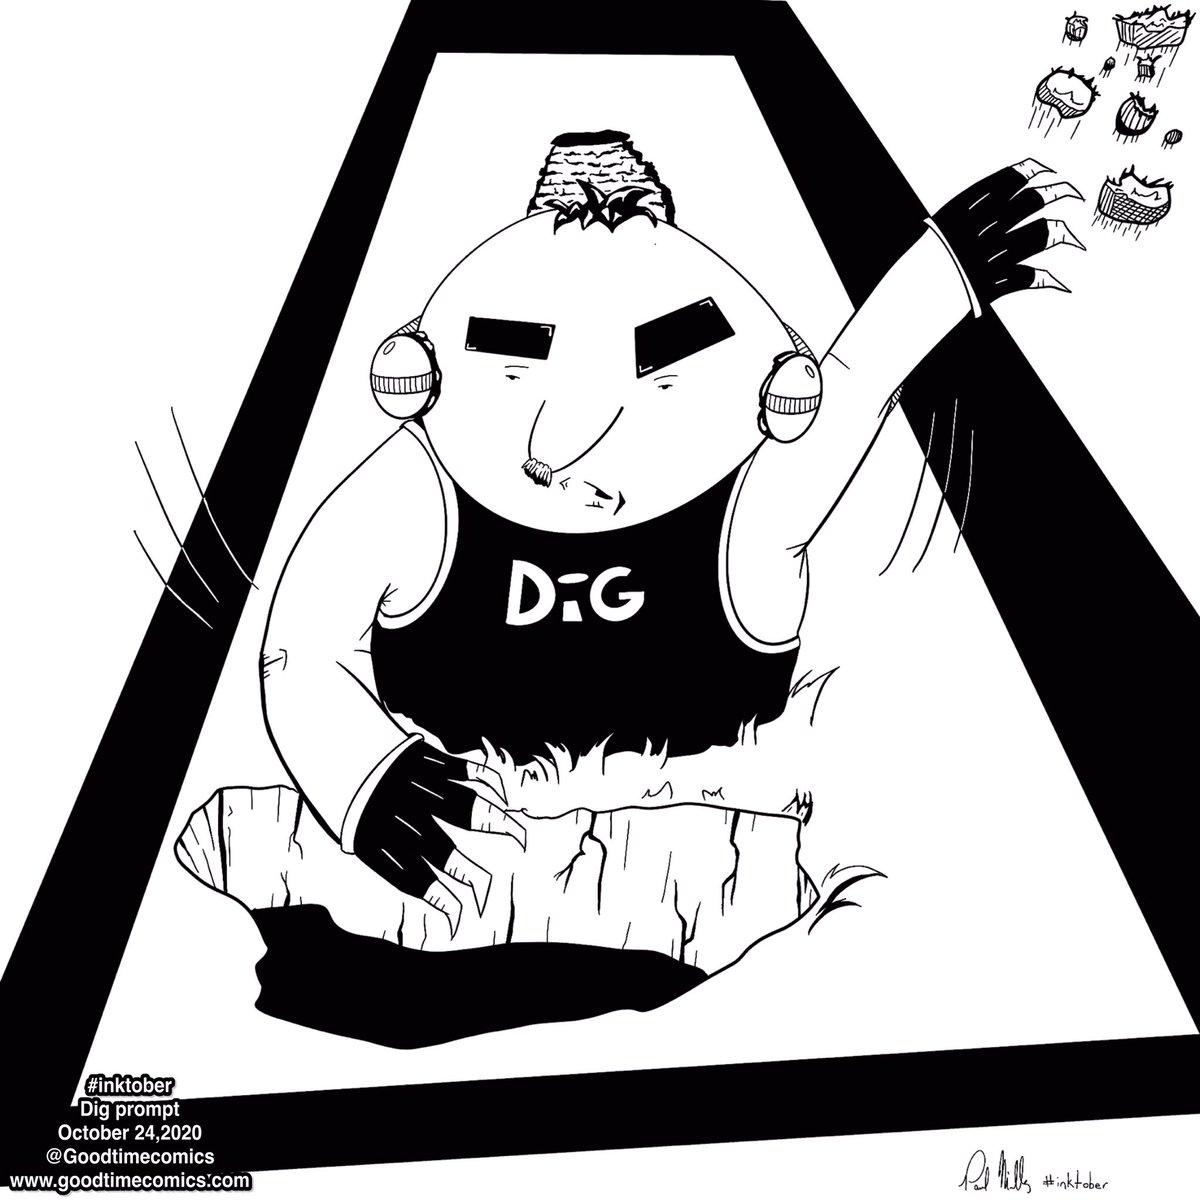 #inktober2020 #day24 prompt is #dig So here's the hard working mole Dig doing his thing   #inktober #inktoberdig #inktoberspotlight #inktoberday24 #inktoberchallenge #inkart #mole #inktoberprompts #draweveryday #drawtober #cartooncharacter #funnyart #inktoberart #digitalink https://t.co/HaqzpDpQkF